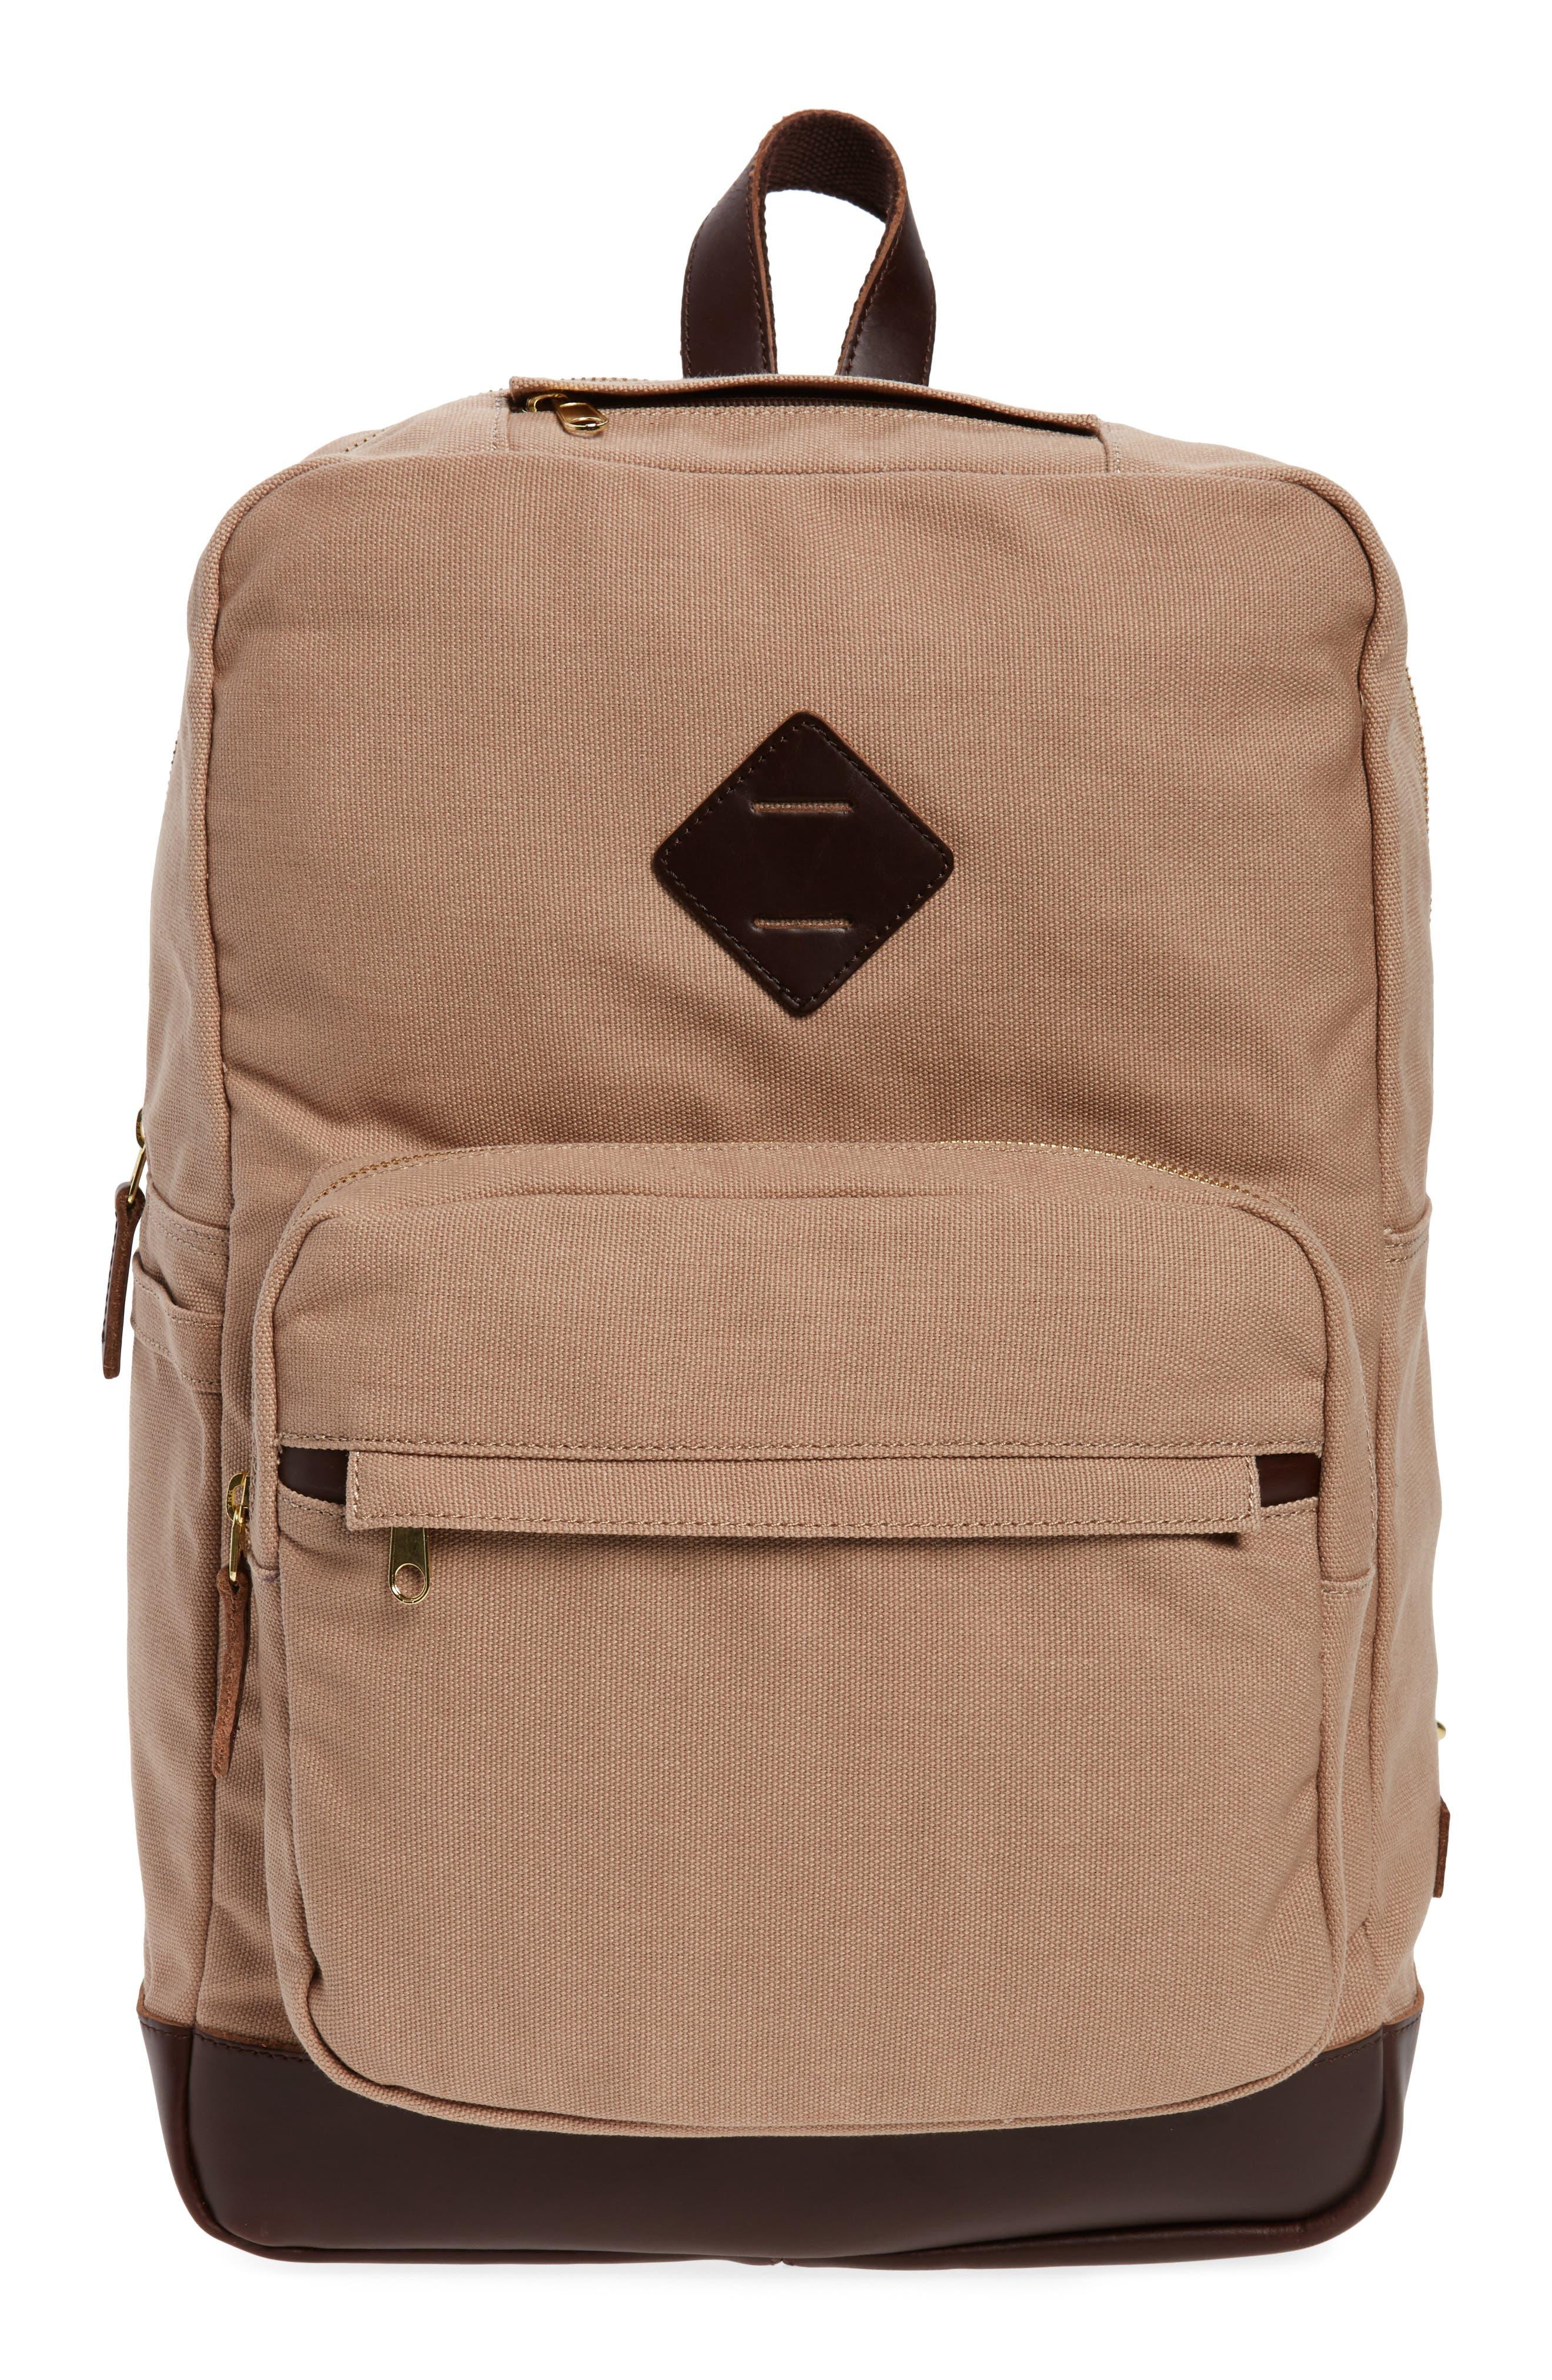 Hudderton Backpack,                         Main,                         color, 250